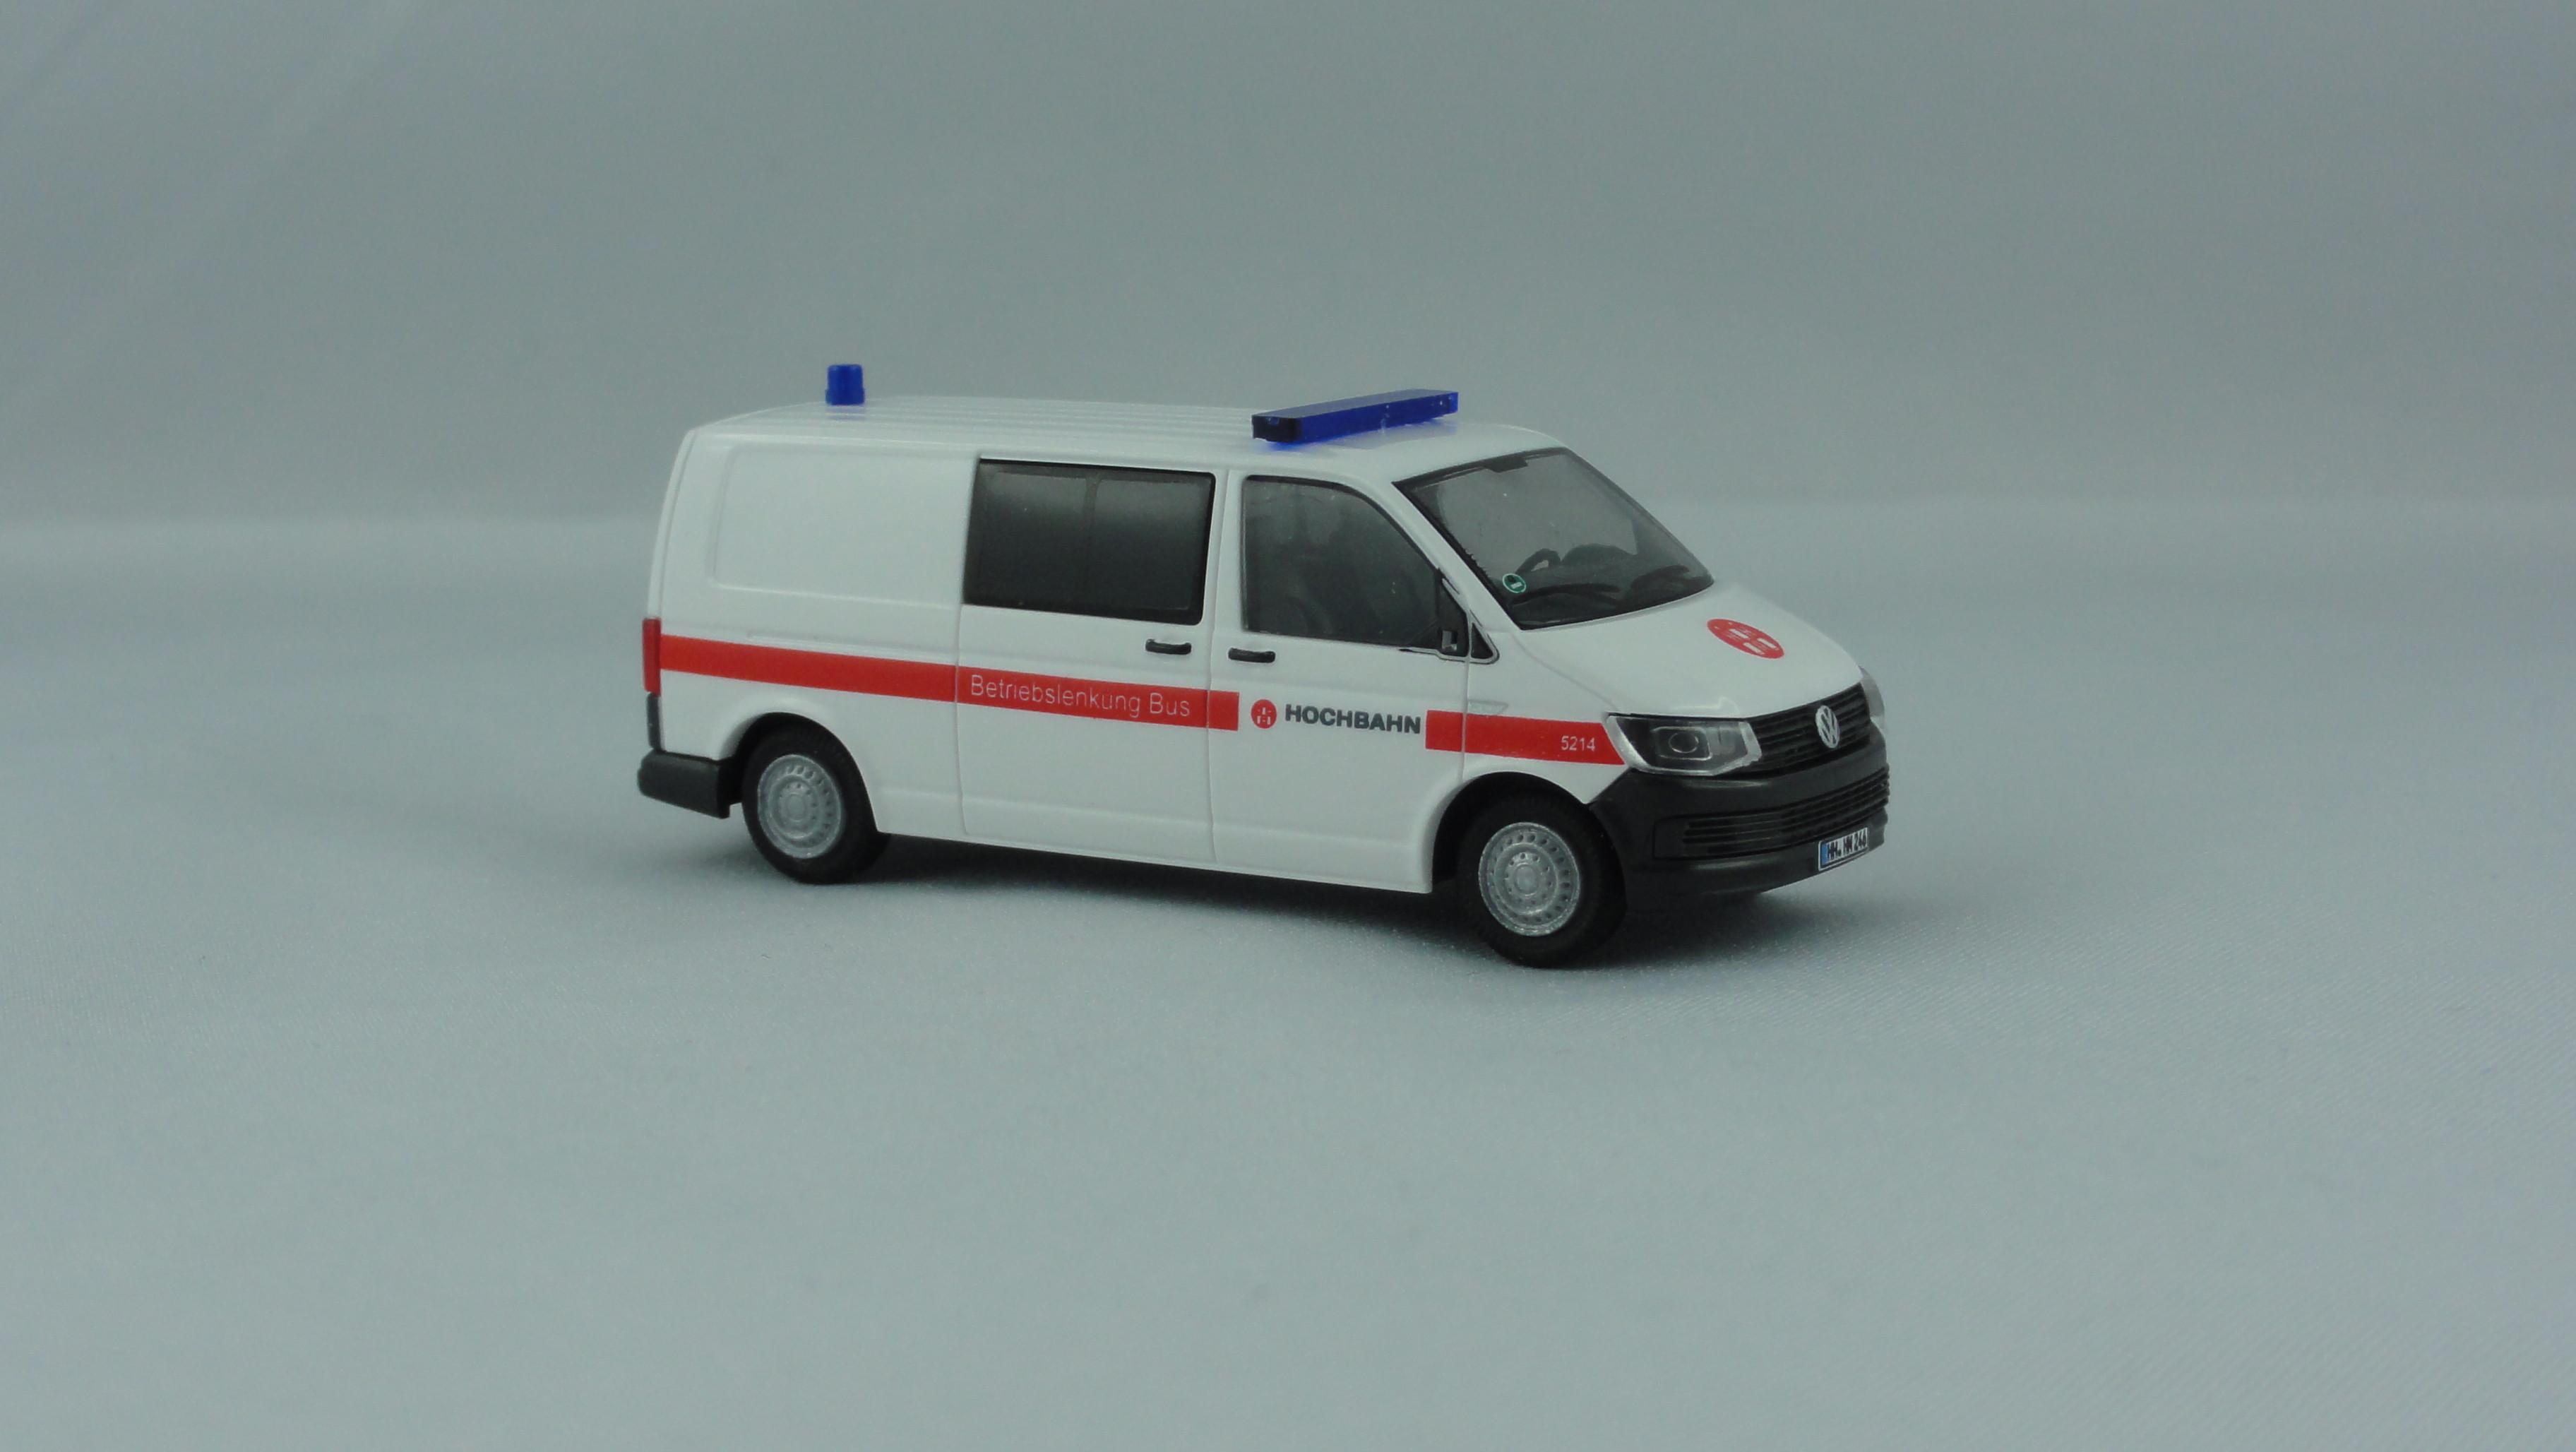 "Rietze VW T6 LR Hamburger Hochbahn "" Betriebslenkung Bus / Unfallhilfsdienst "", Hochbahn Edition No.10 / Sondermodell"